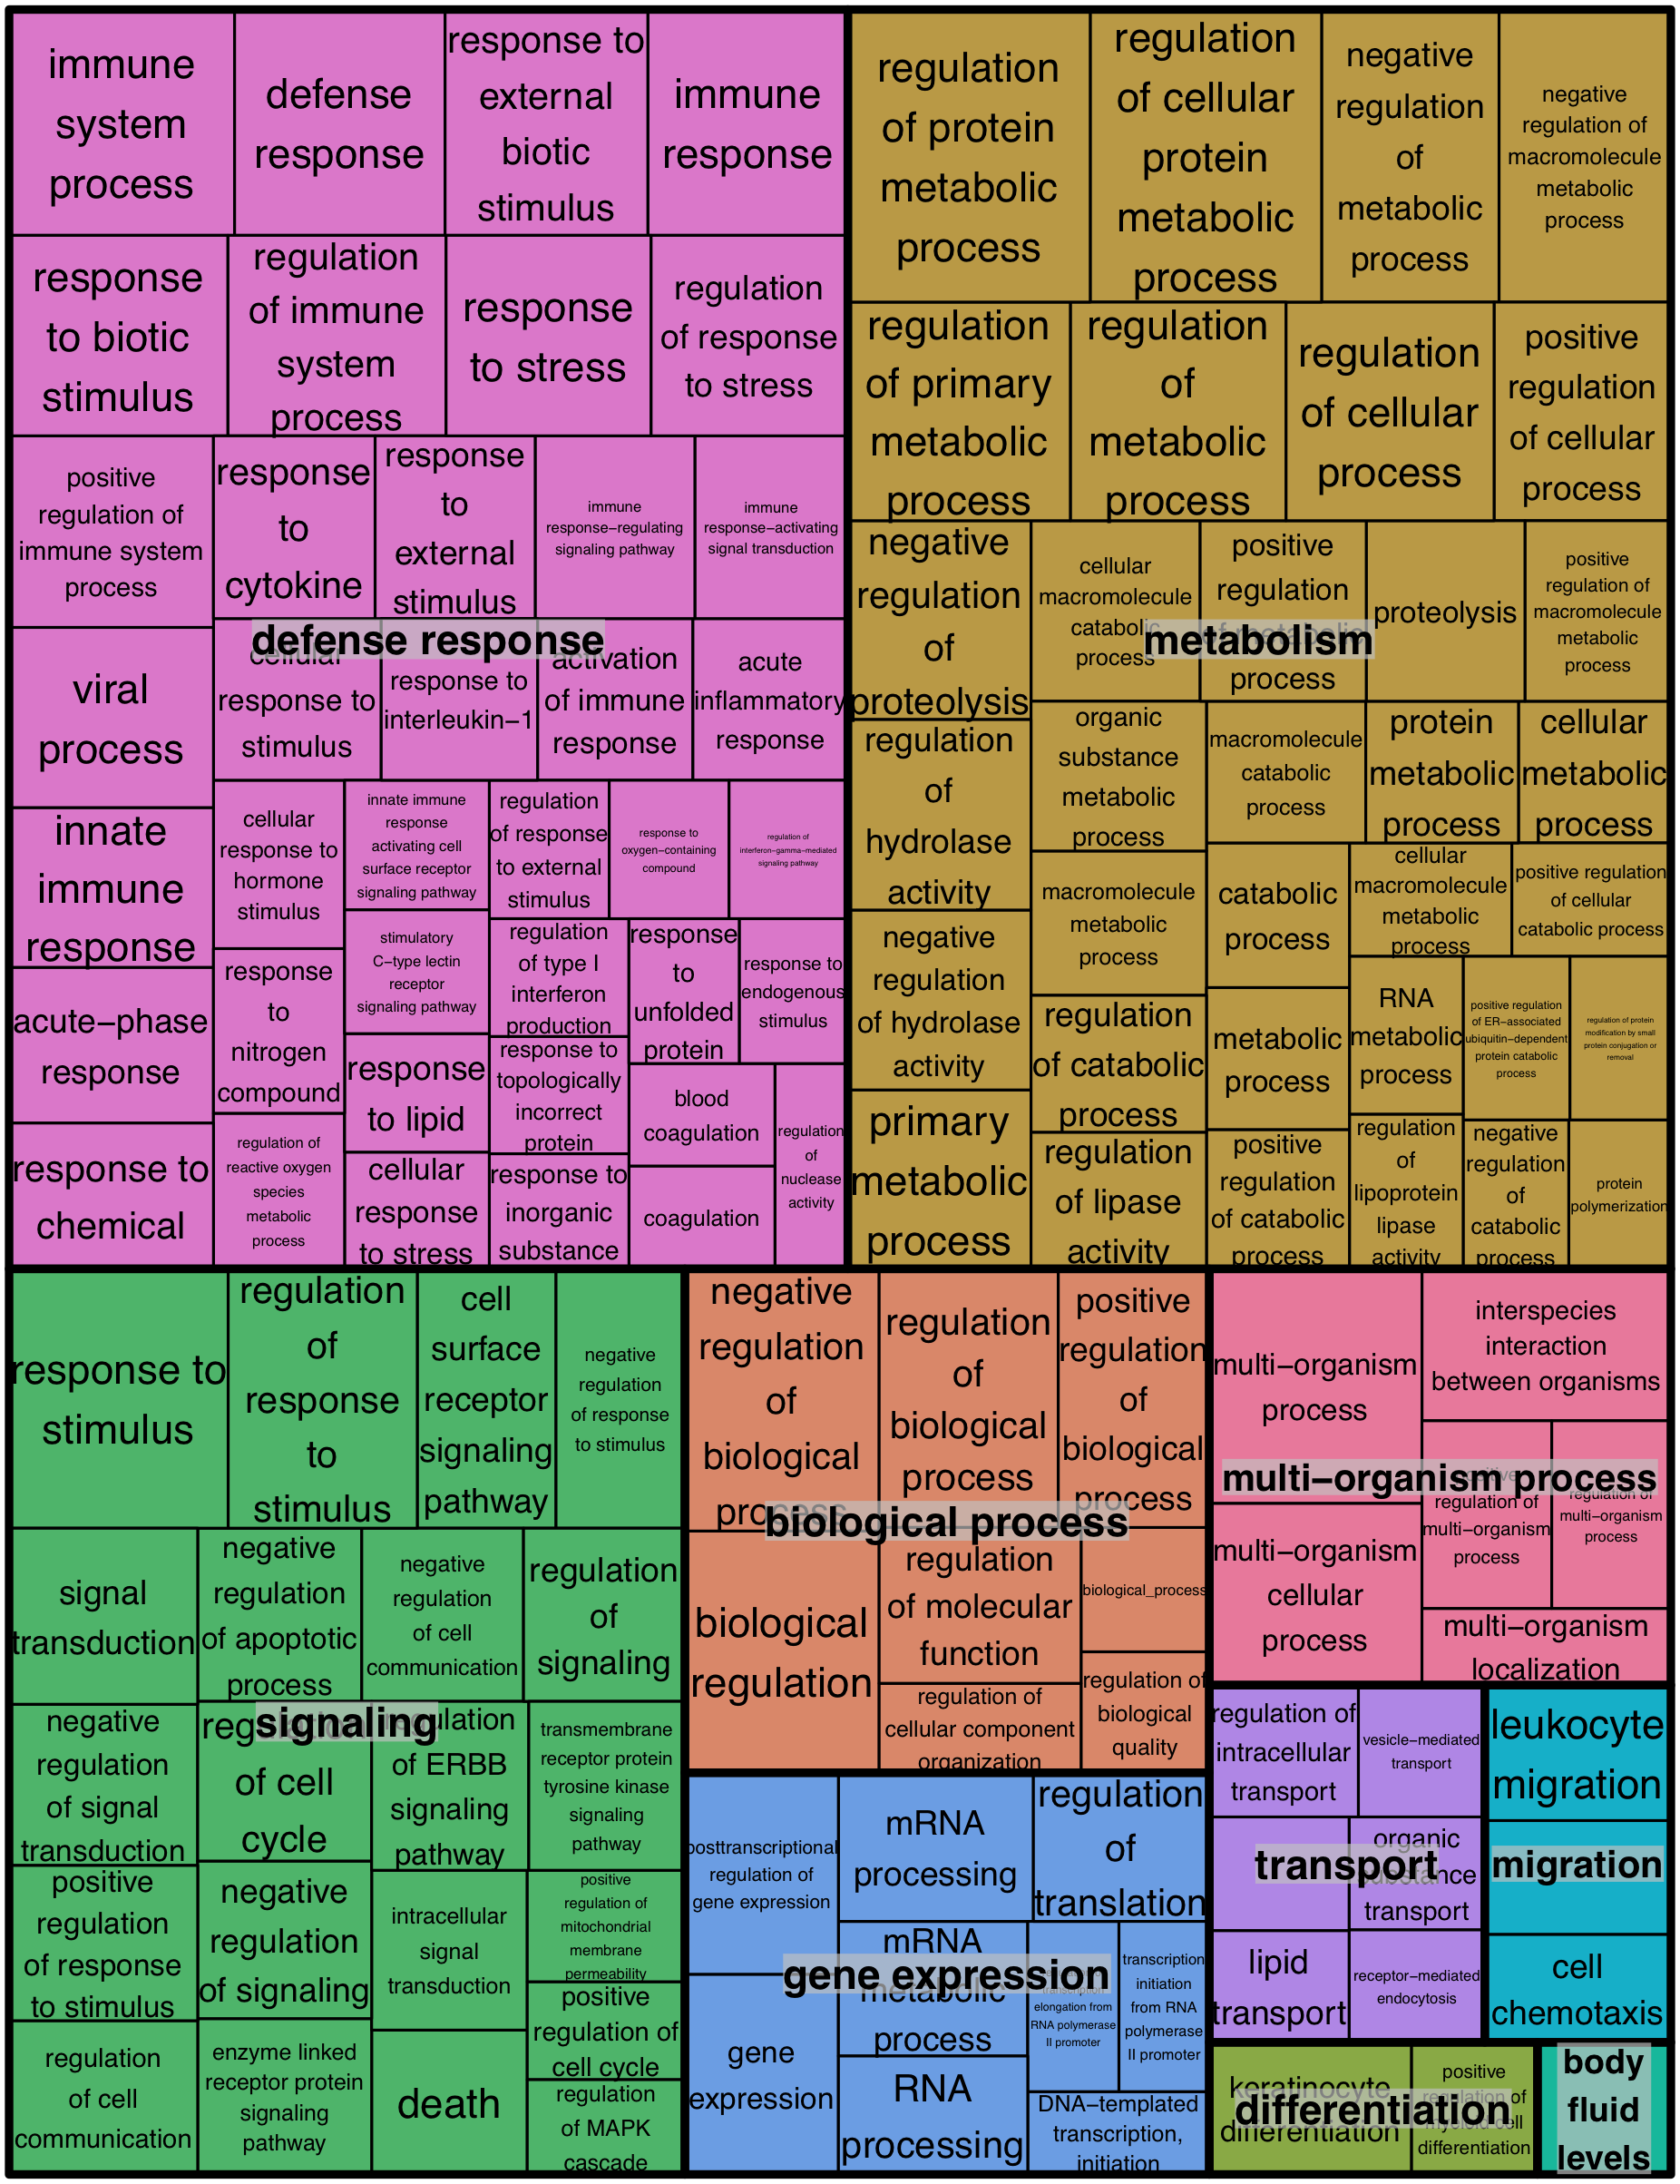 REVIGO treemap summarizing gene ontology biological process categories over-represented in WNS-affected tissues.